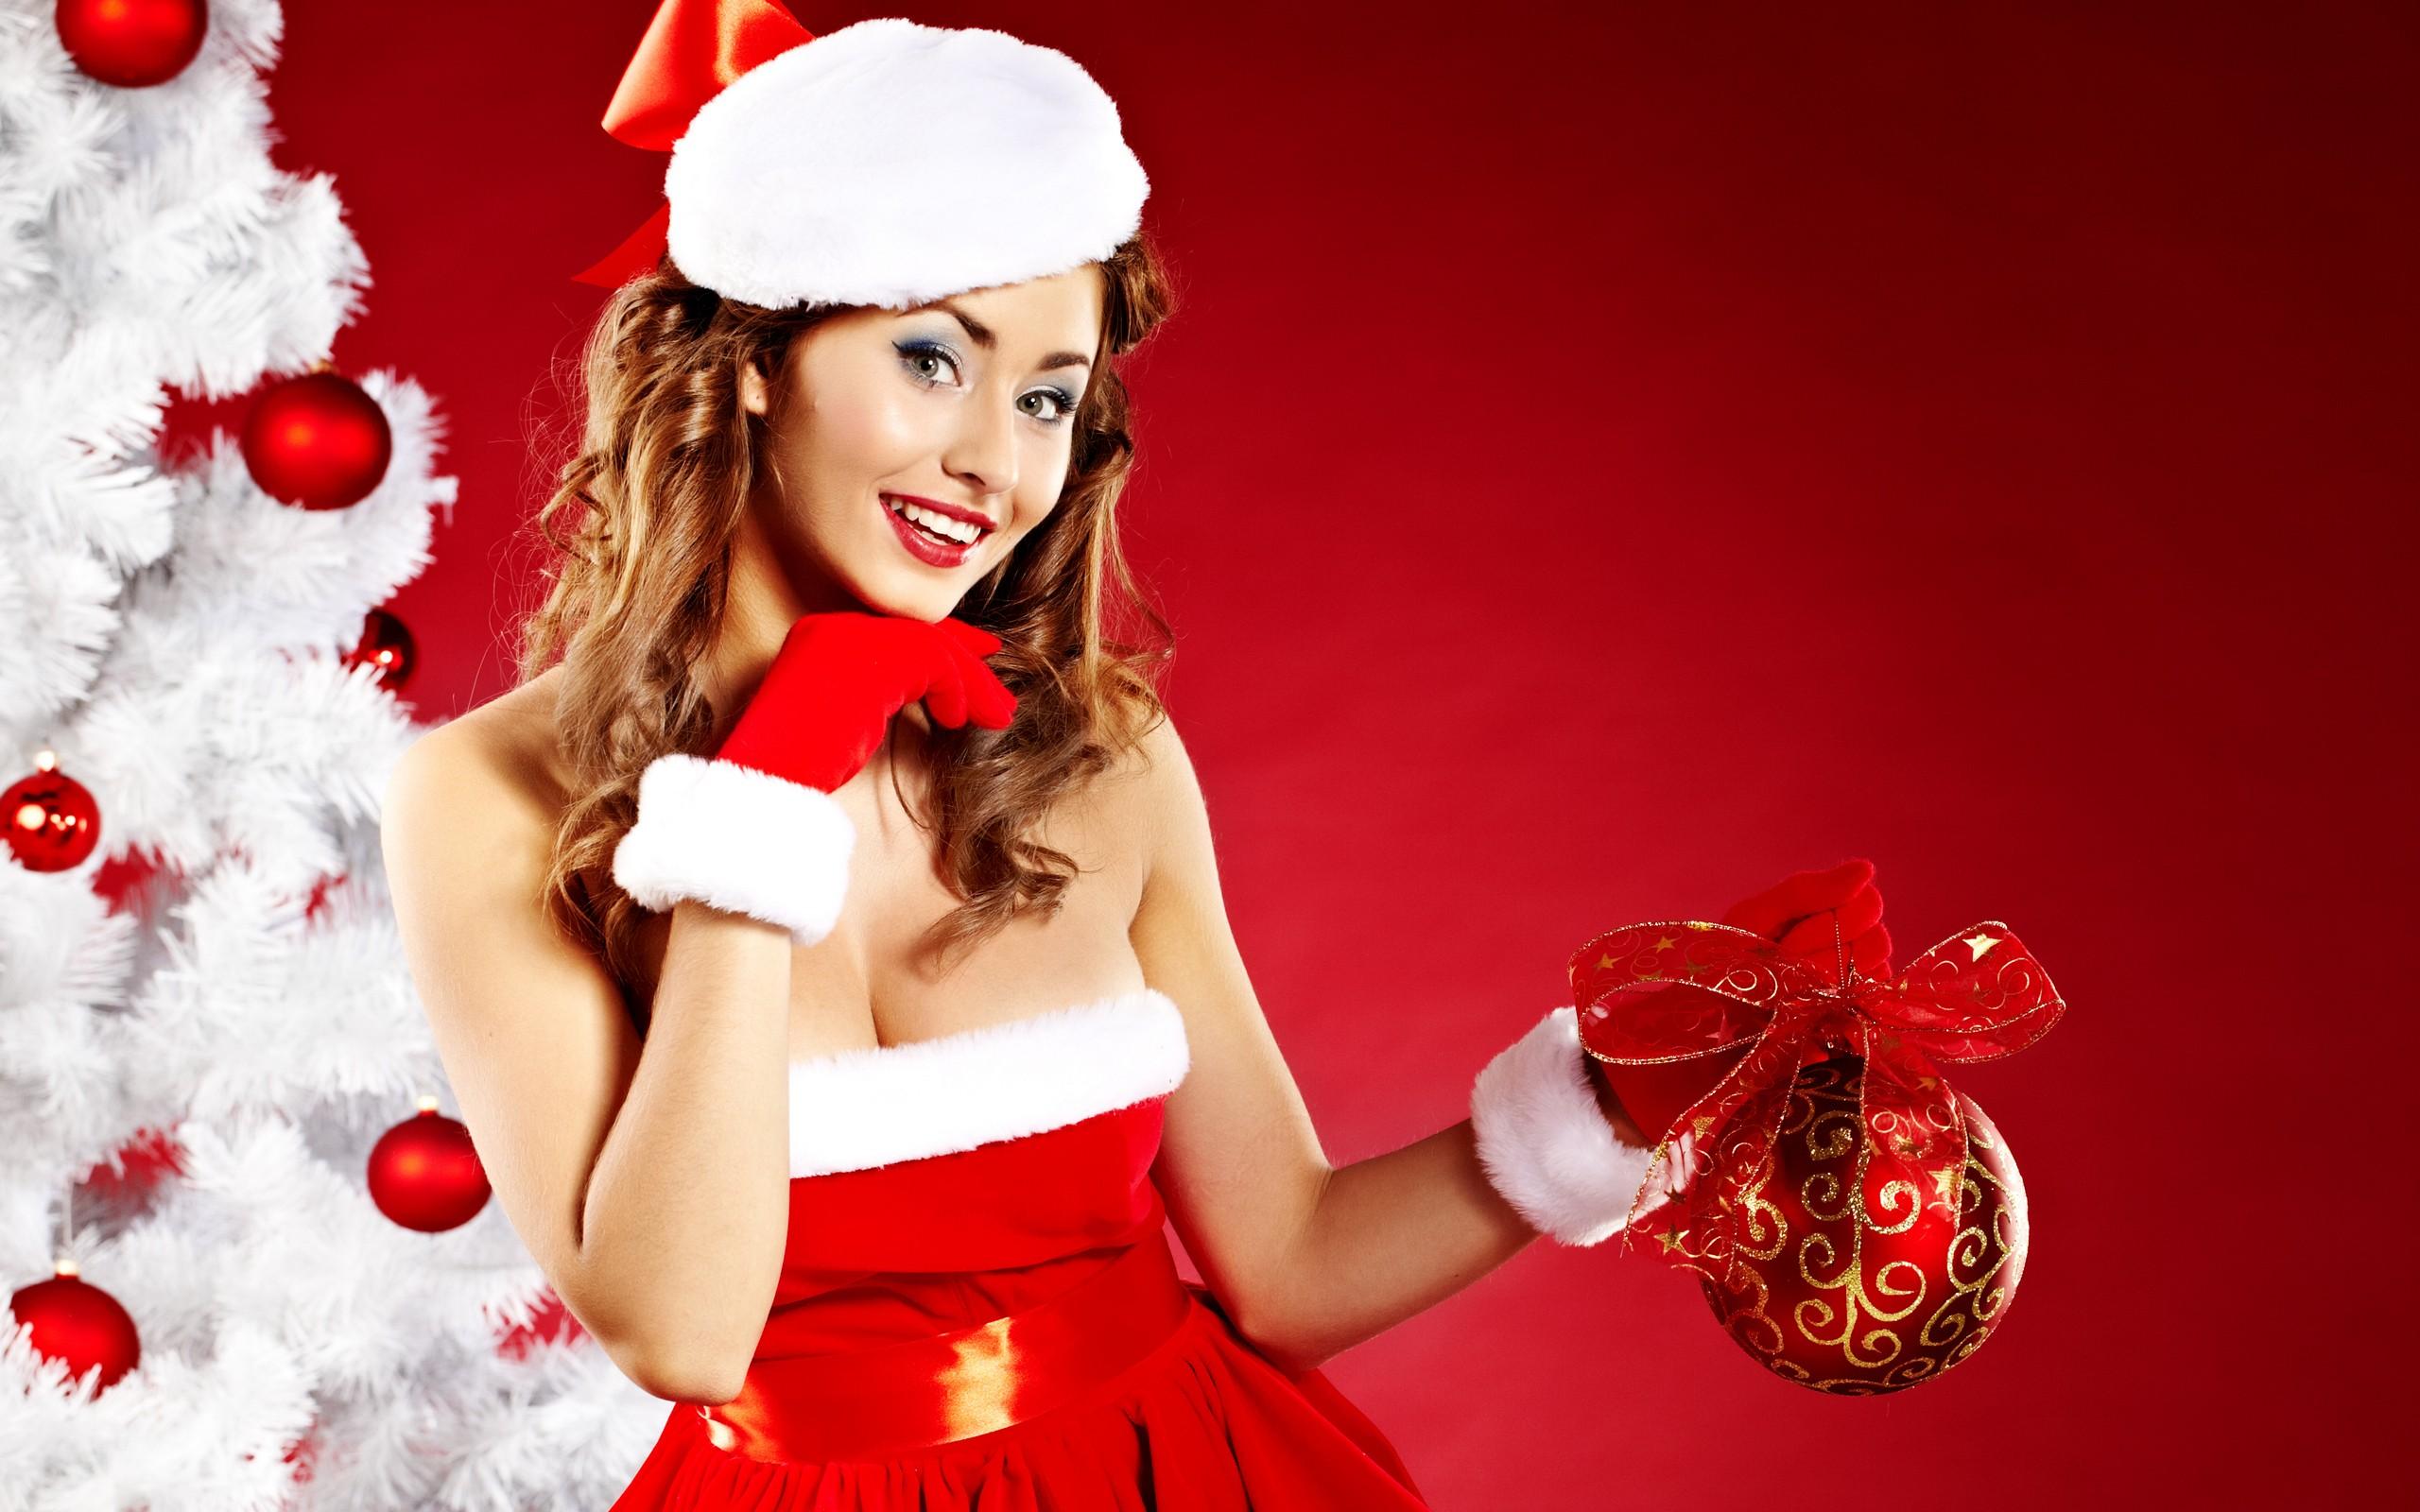 Woman Santa Claus wallpaper - 1049507